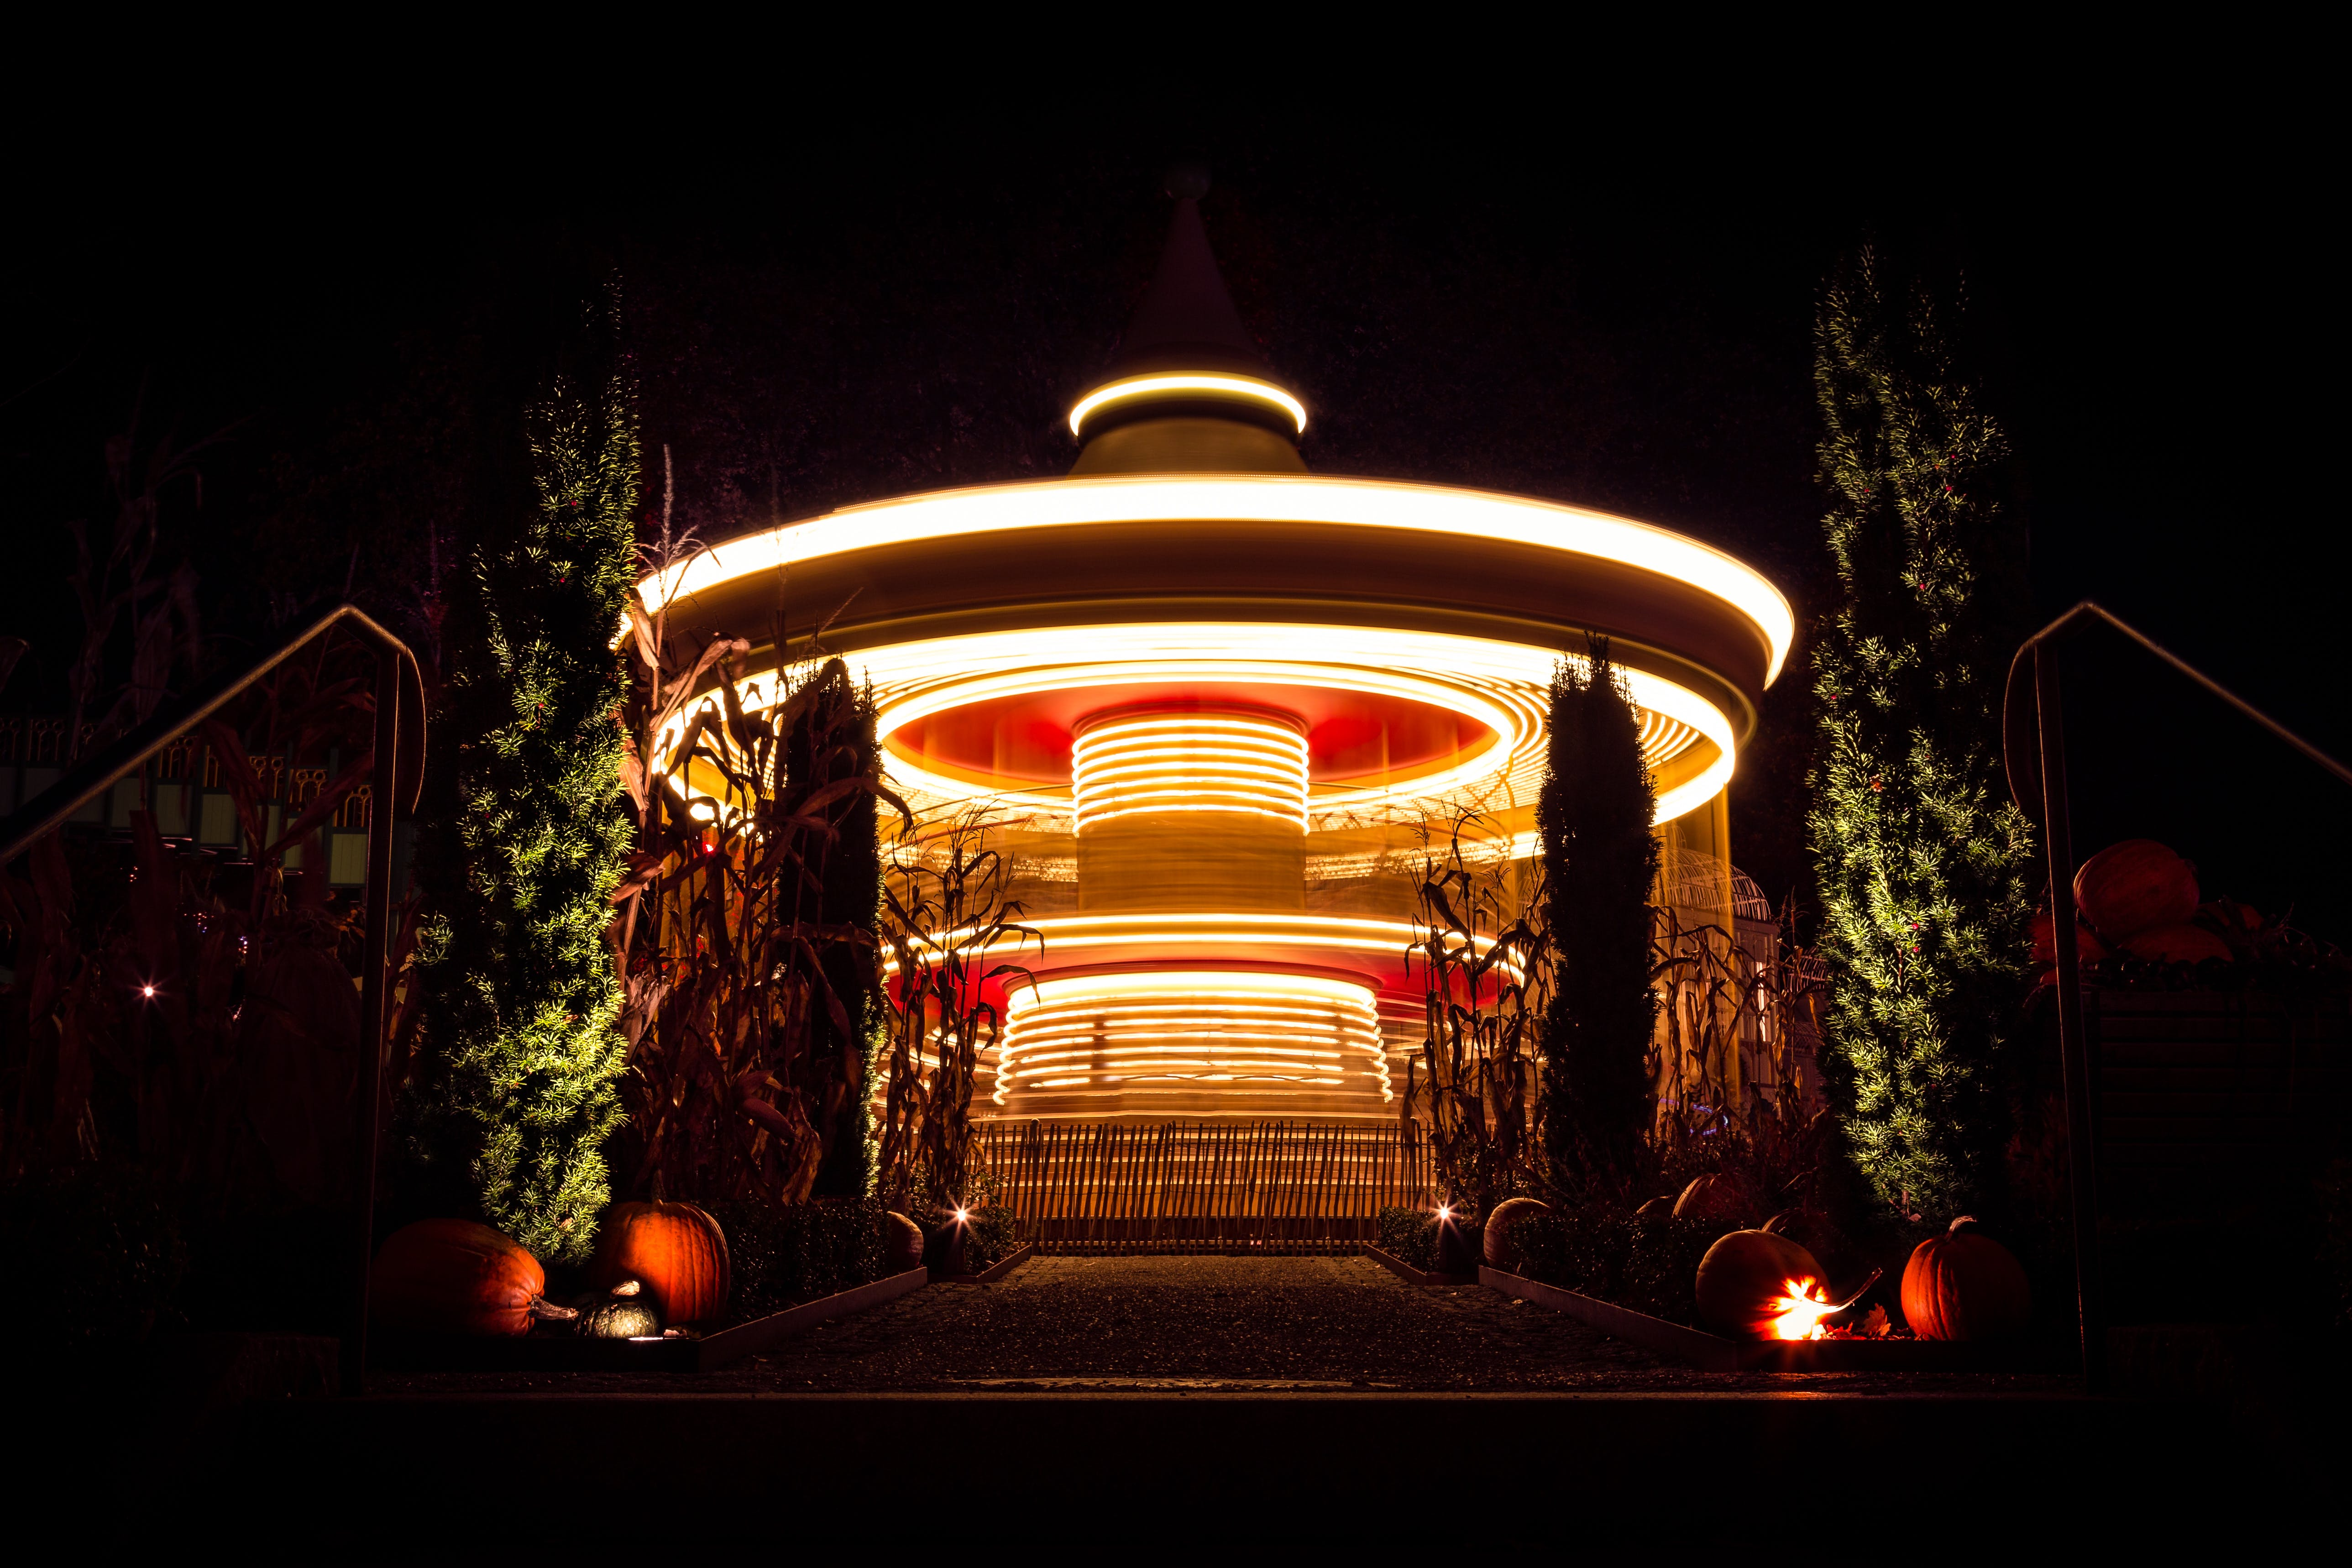 Kostenloses Stock Foto zu halloween, karussell, kornfeld, kürbisse